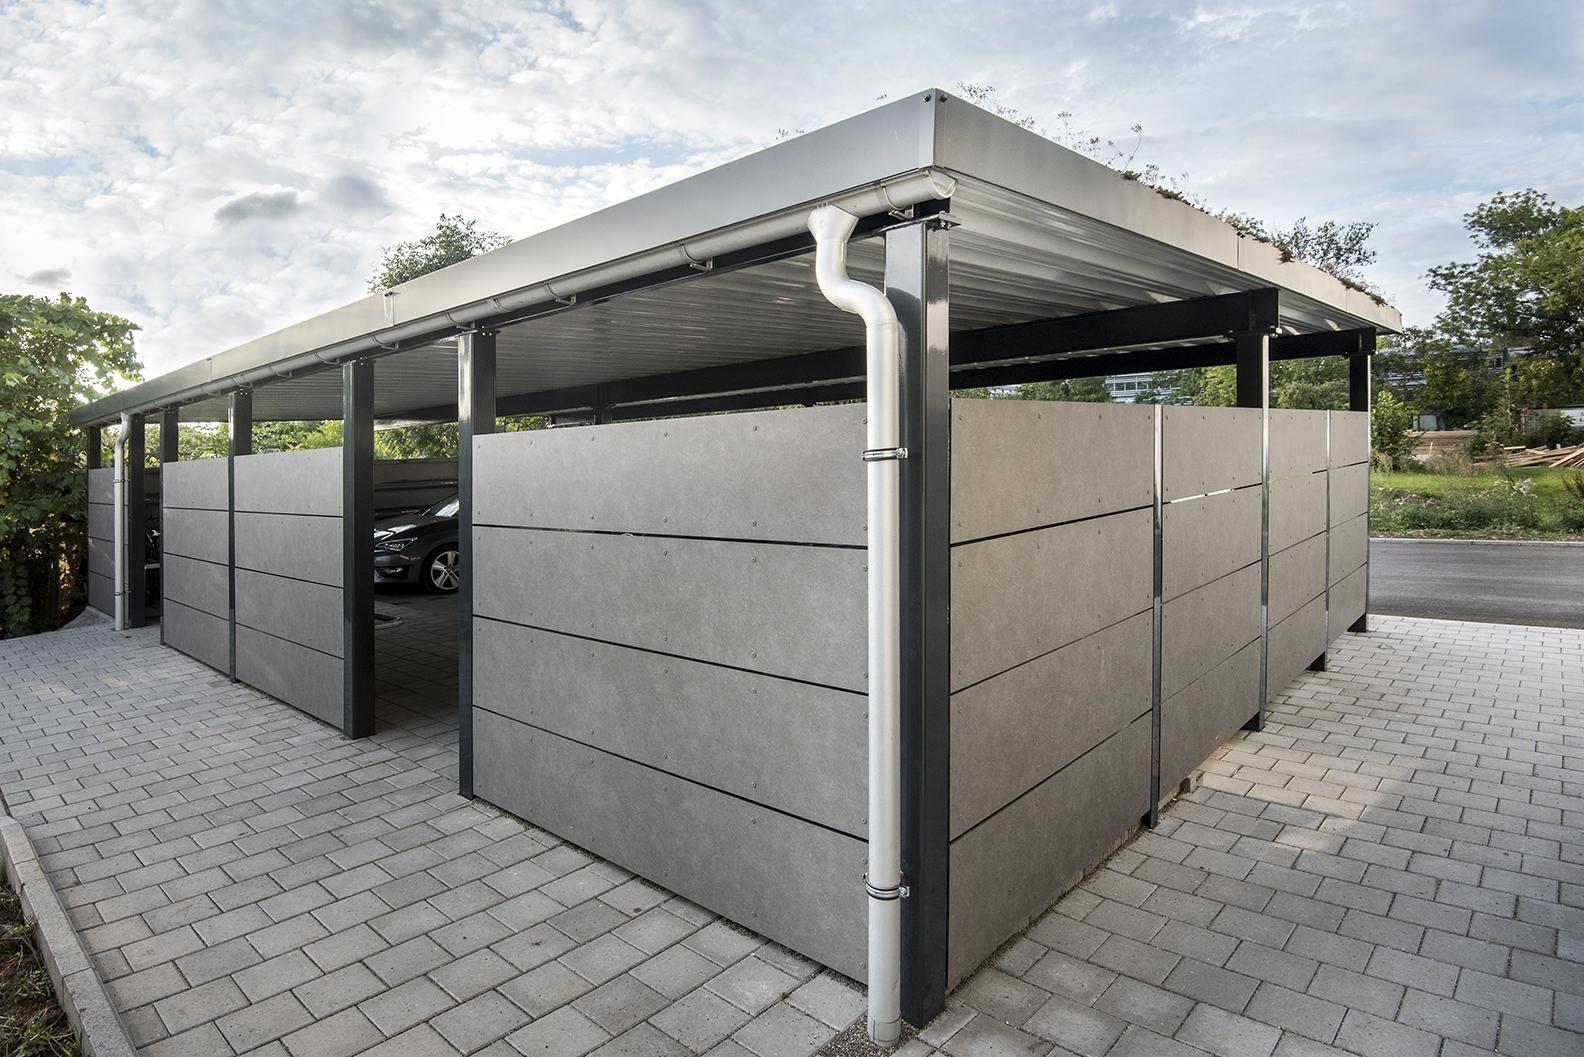 Carport Metall Carport Metall Fassade Haus Carport